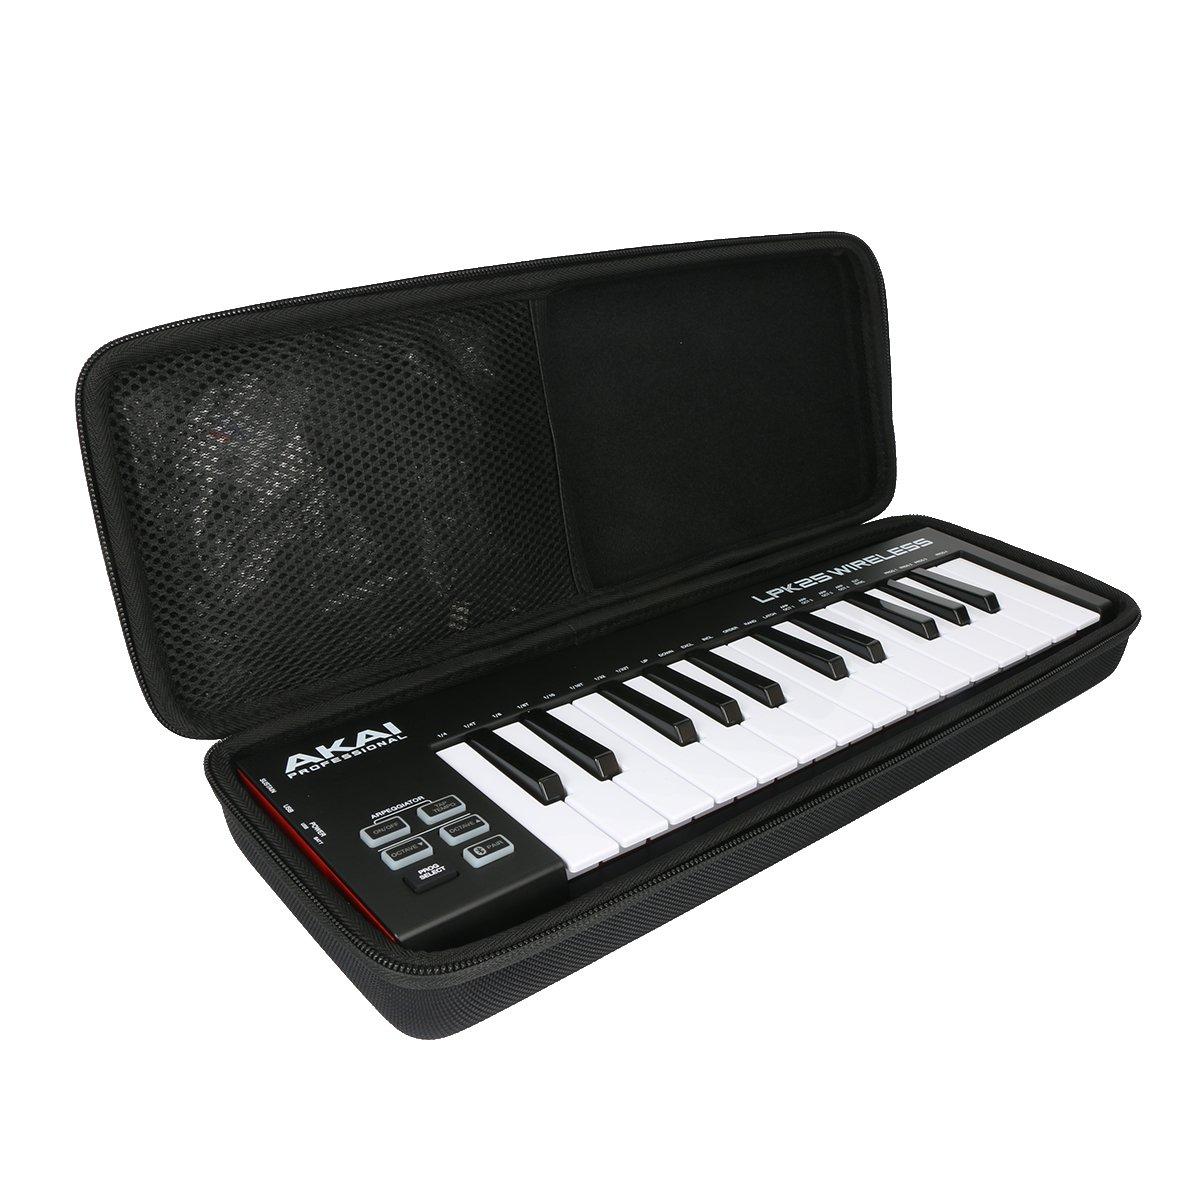 Khanka Hard Case for Akai Professional Akai Professional LPK25 WIRELESS | 25 Mini-Key Bluetooth MIDI Keyboard by Khanka